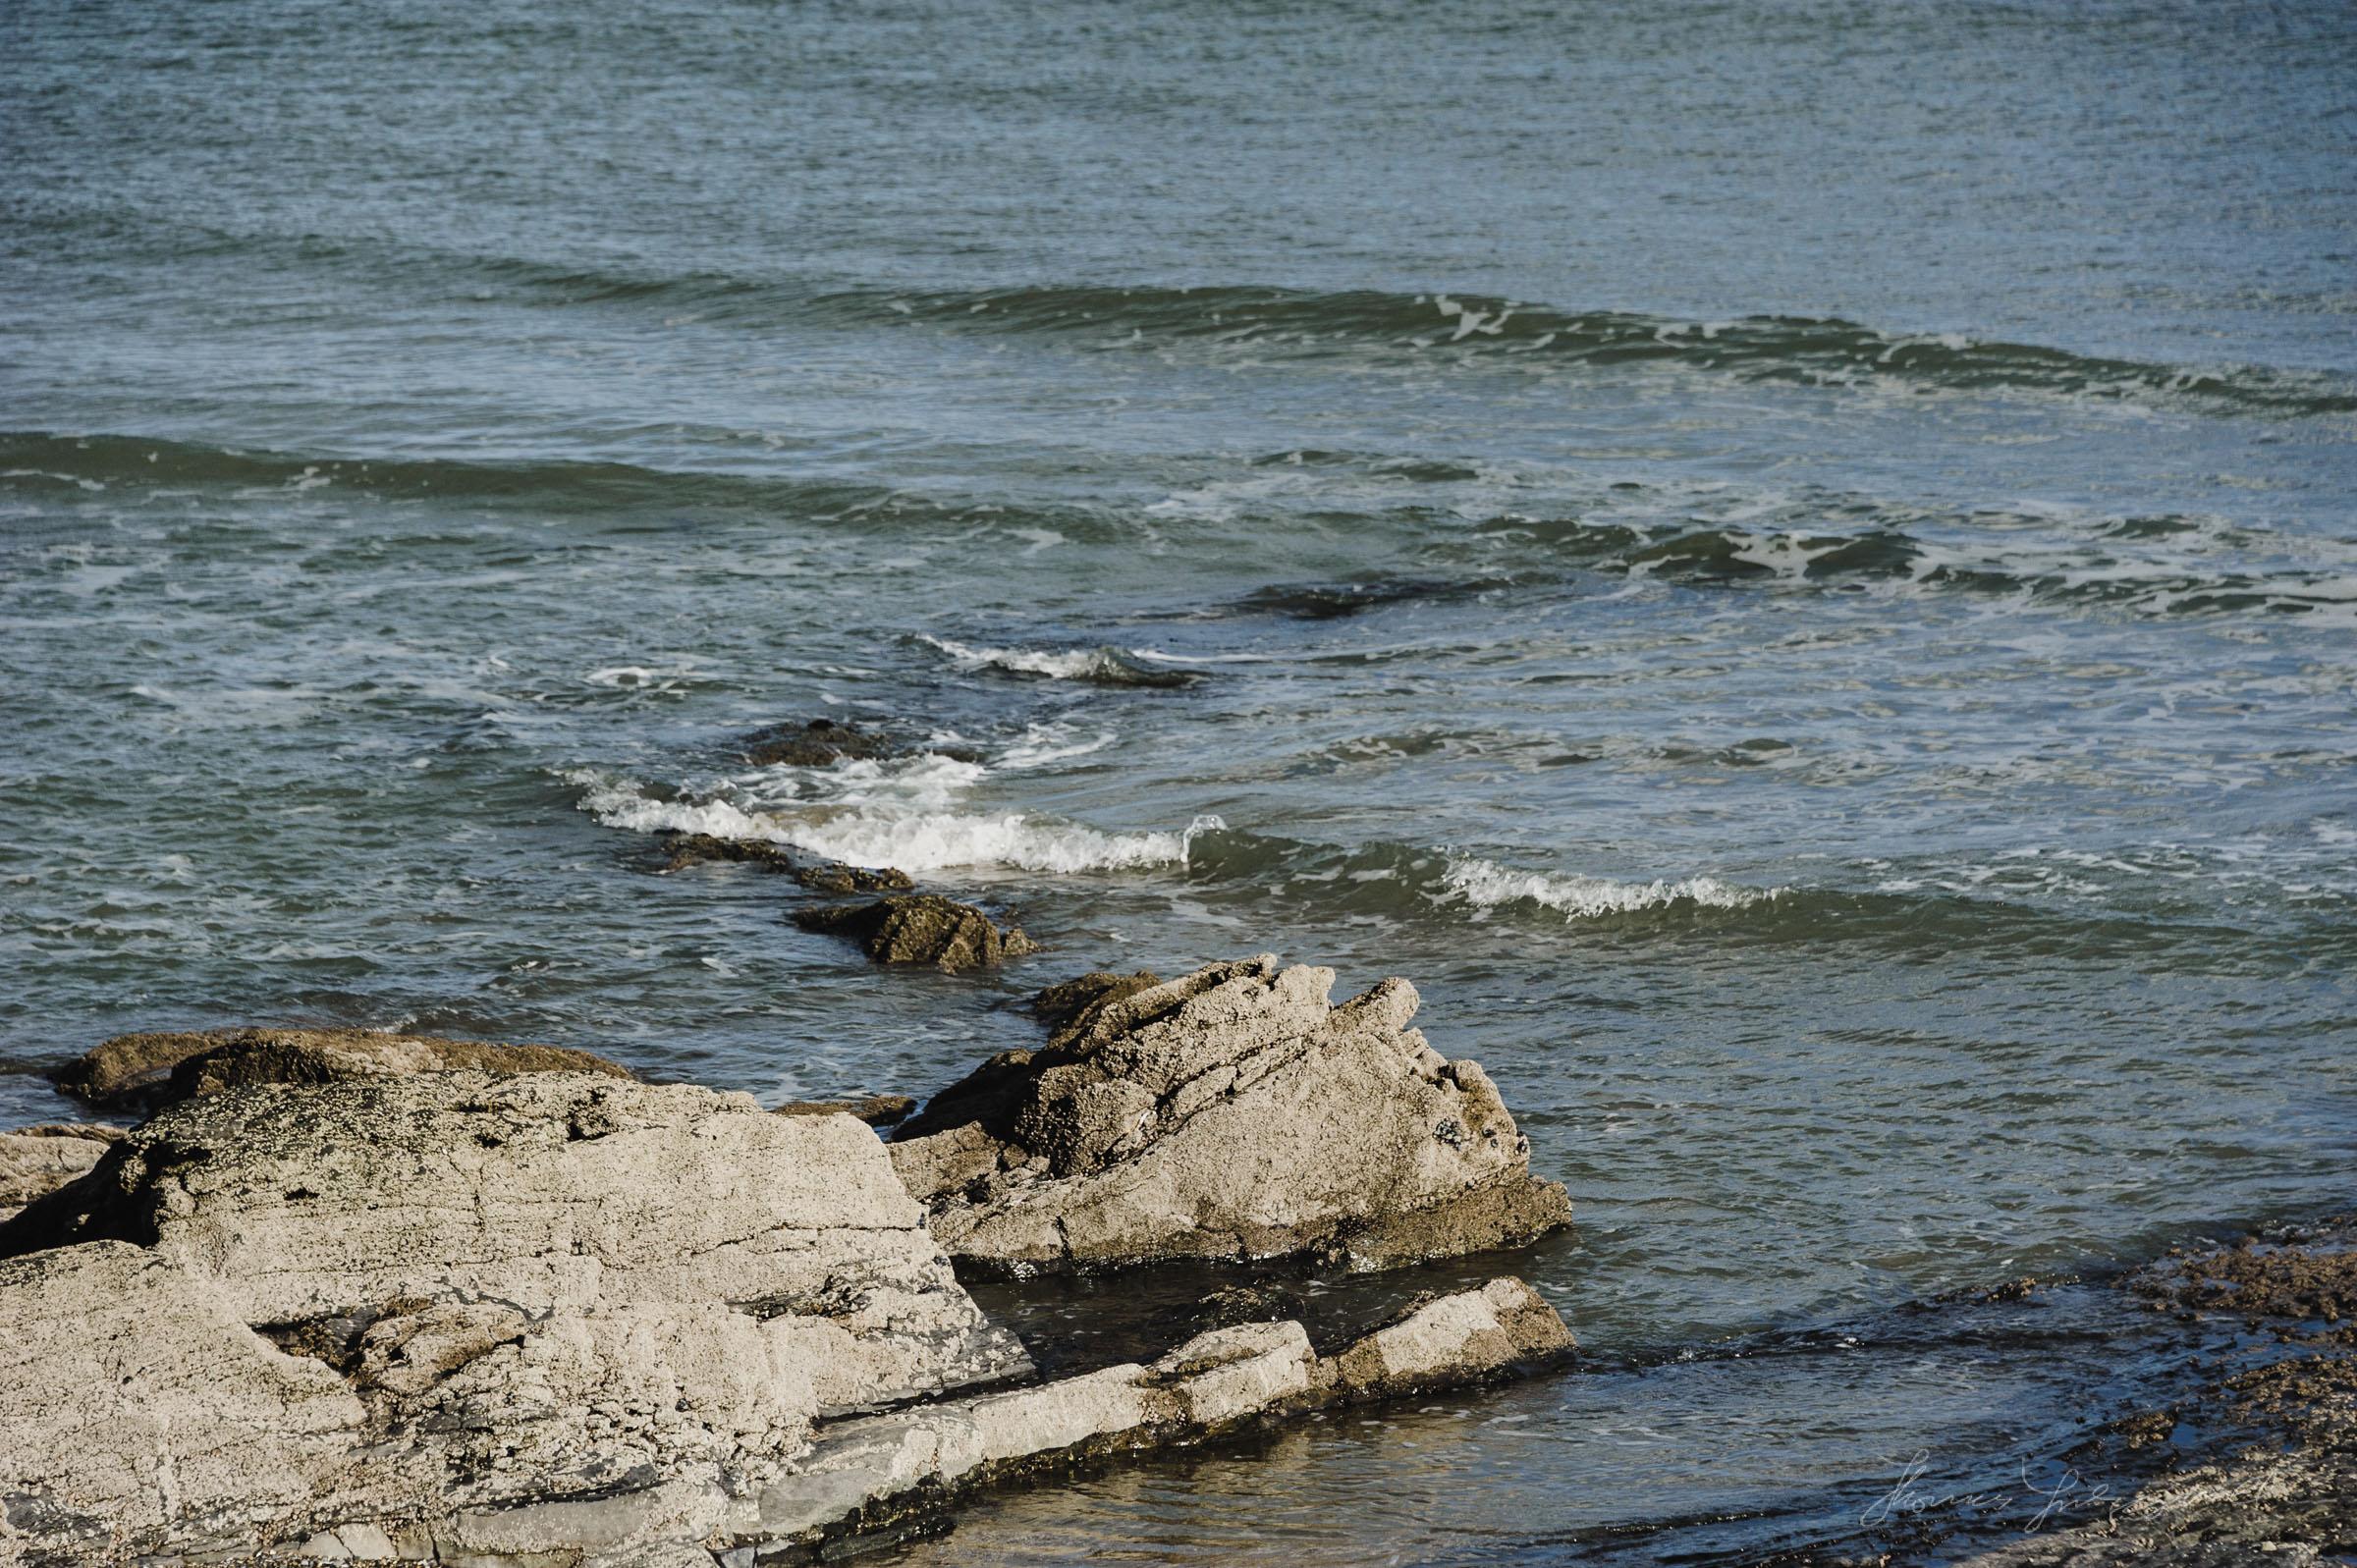 Rocky outcrop in the Irish sea, malahide Co. Dublin